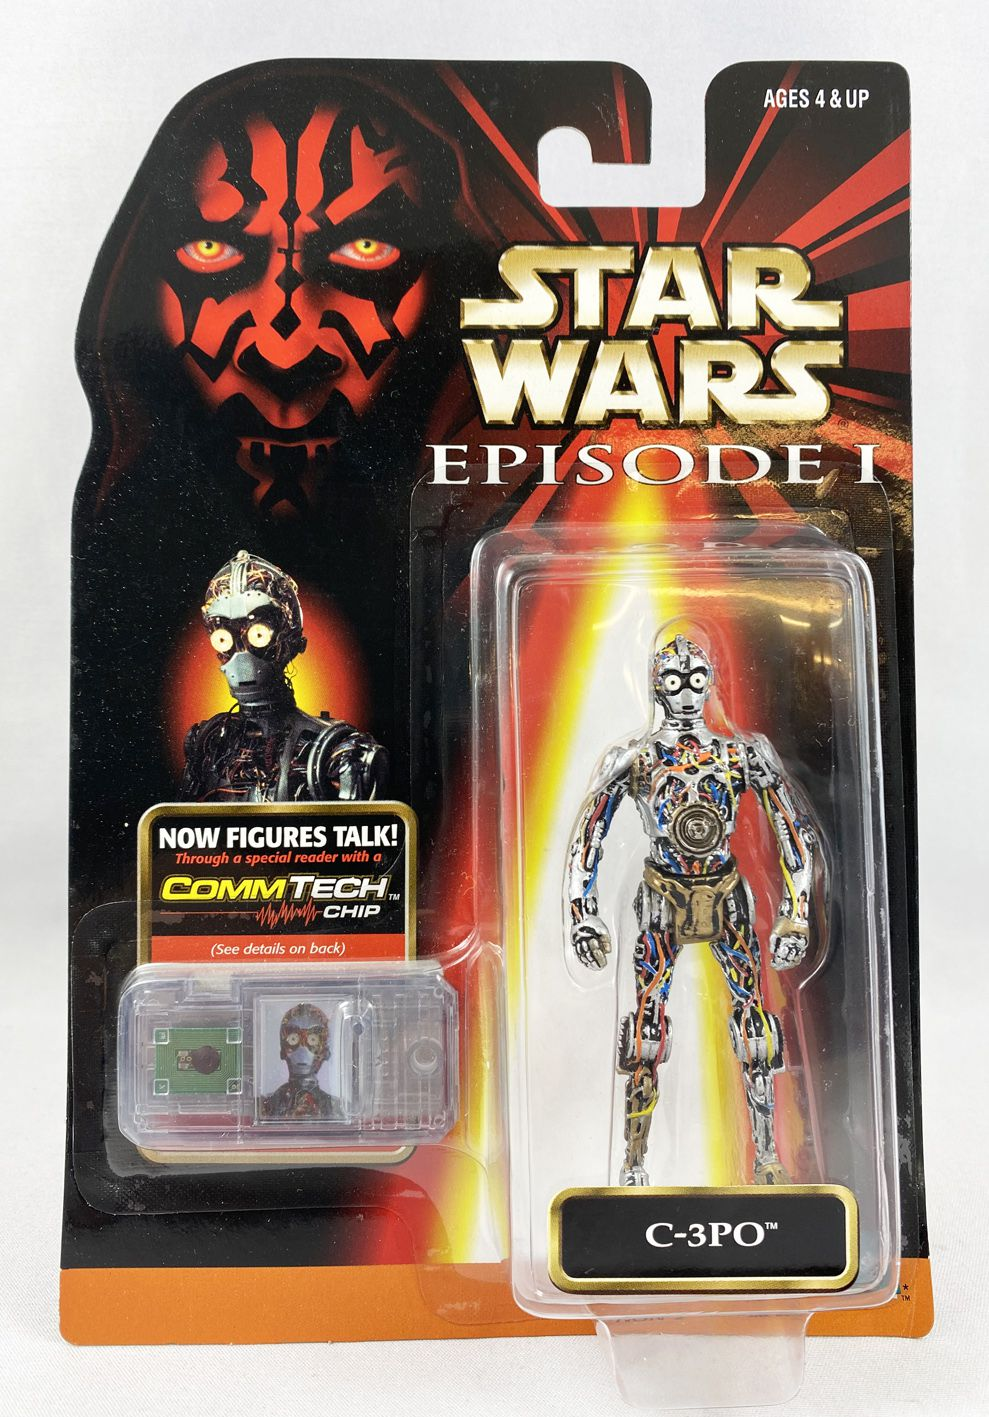 Star Wars Episode 1 (The Phantom Menace) - Hasbro - C-3PO